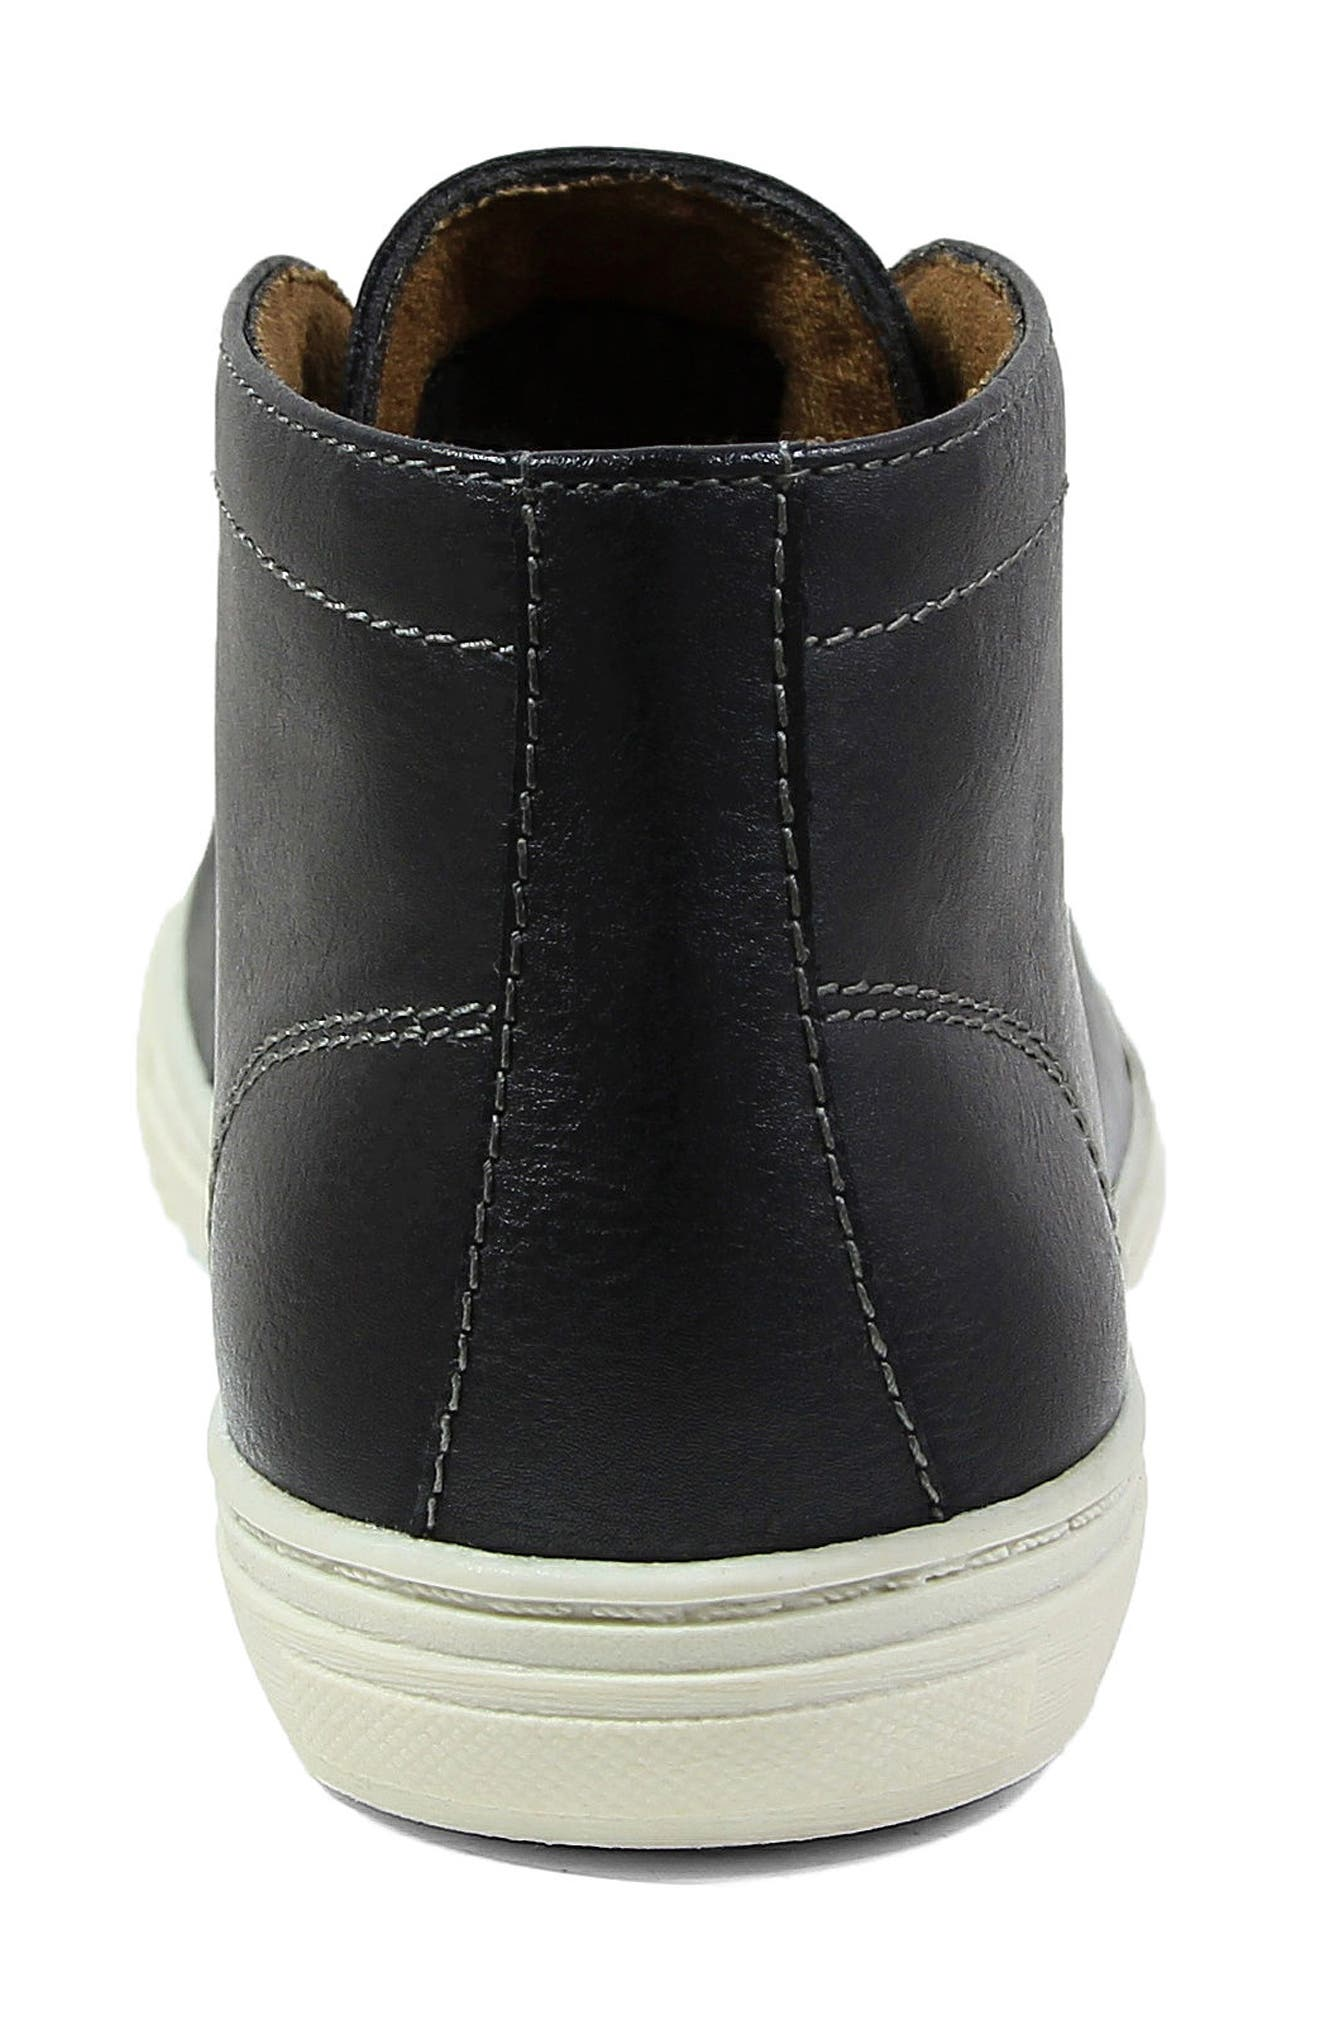 FLORSHEIM, Curb Chukka Sneaker Boot, Alternate thumbnail 6, color, 001